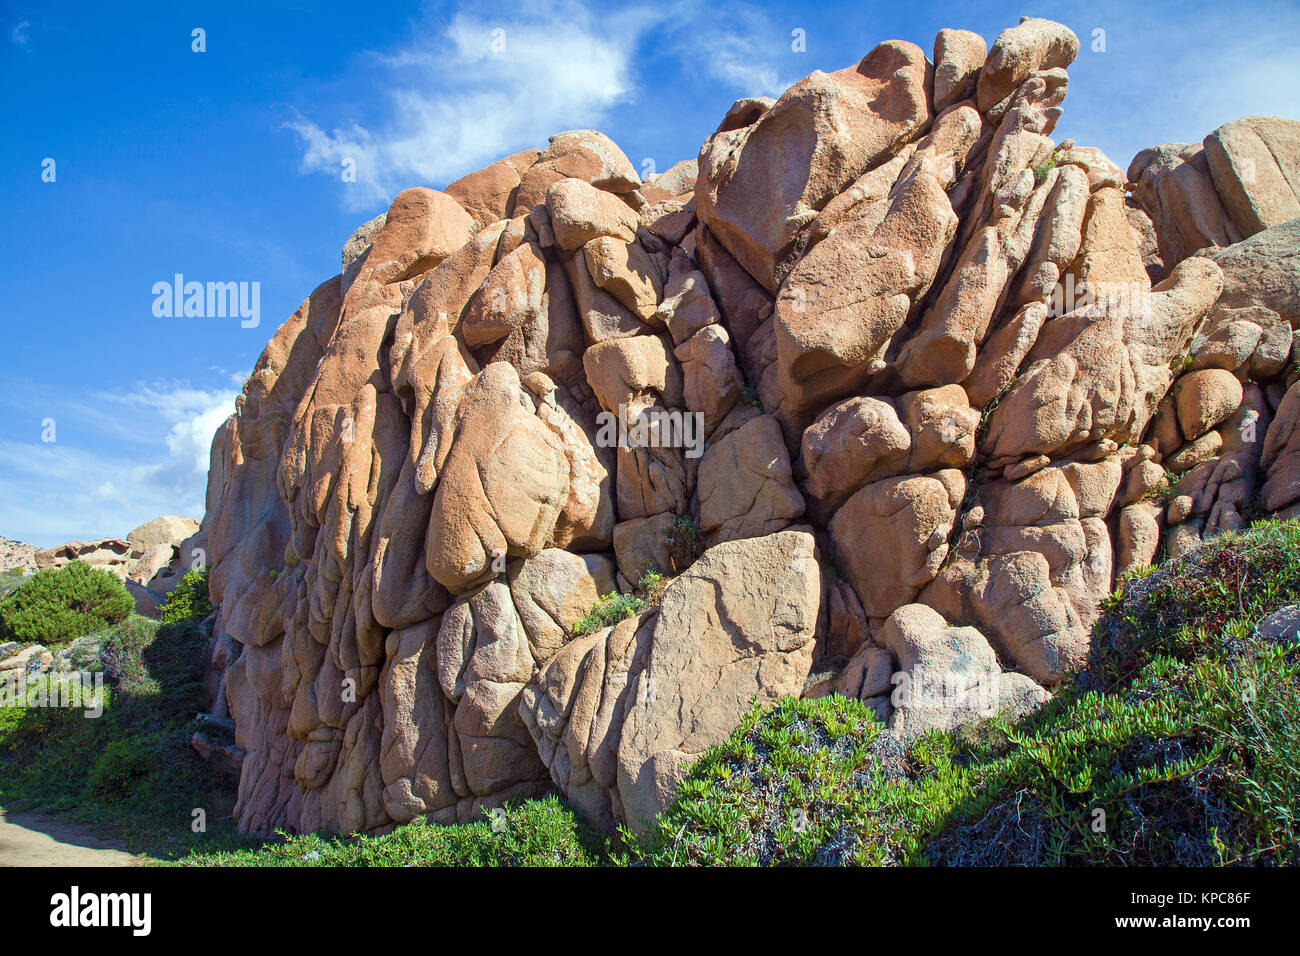 Roche de porphyre à Costa Paradiso, Sardaigne, Italie, Méditerranée, Europe Photo Stock